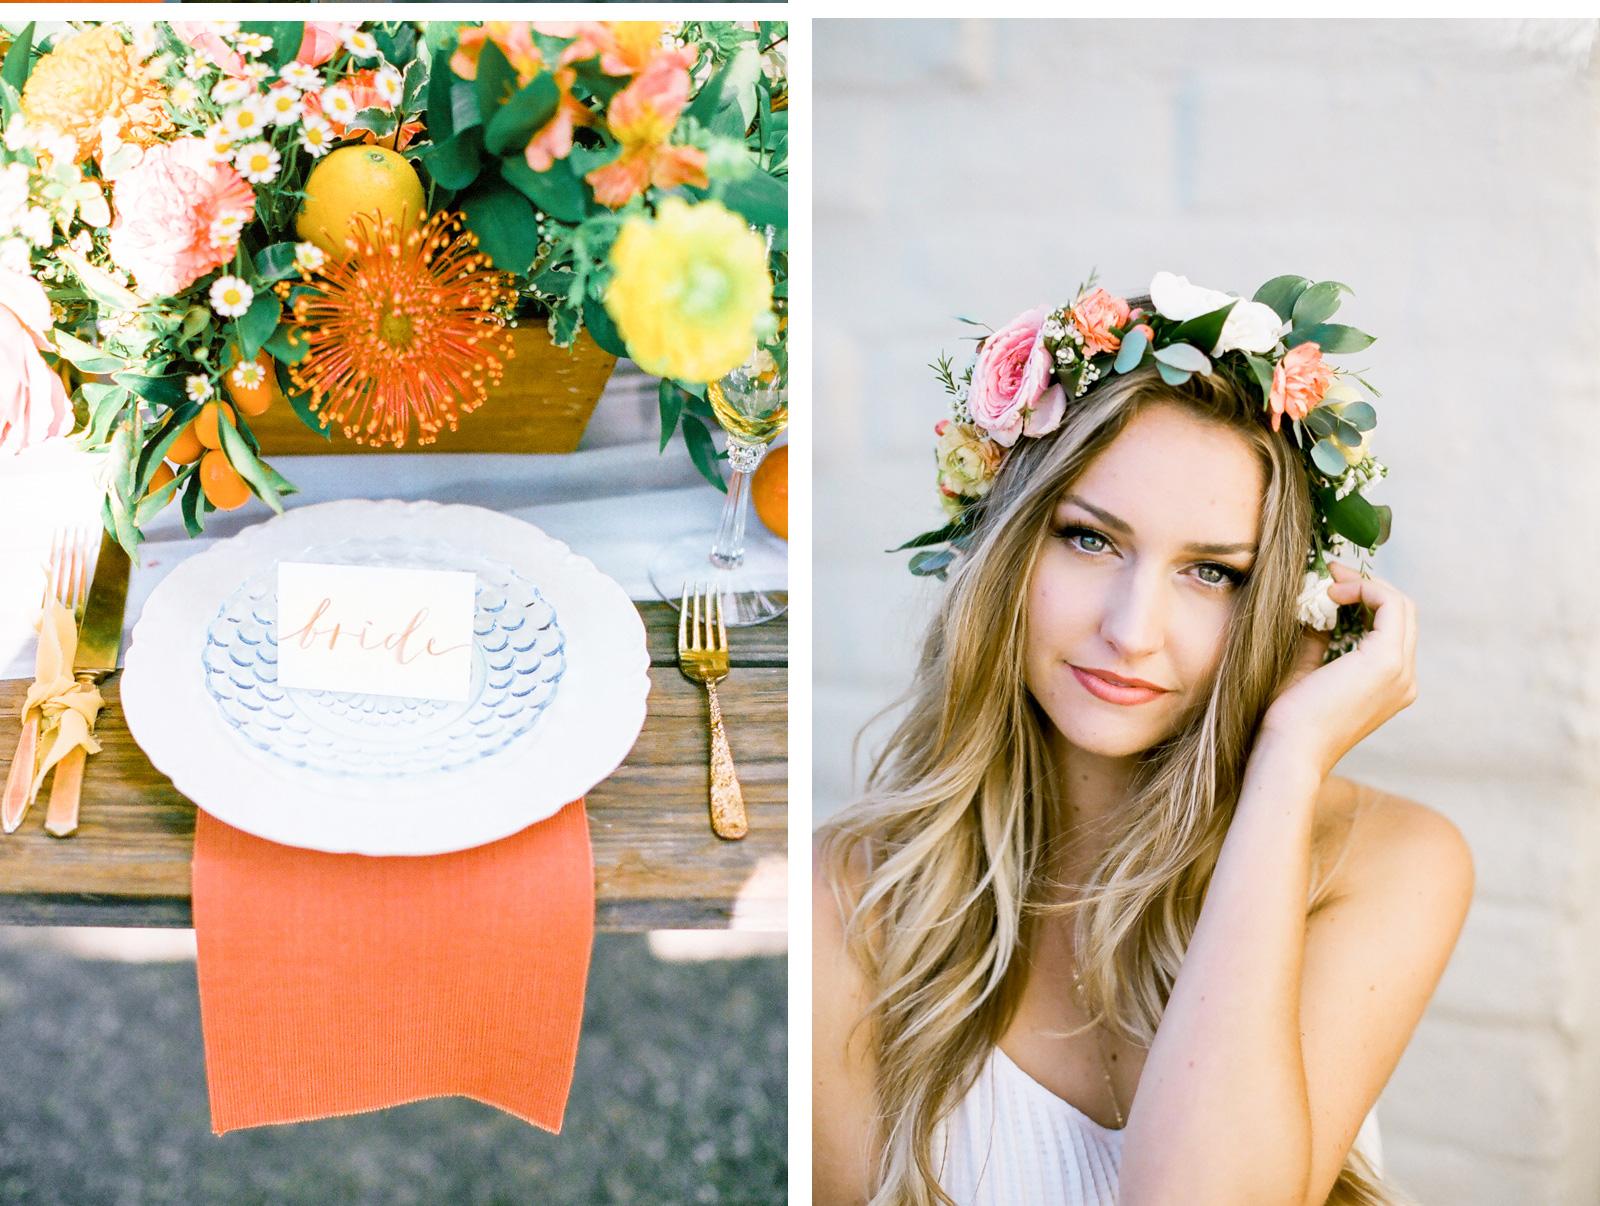 Whispering-Rose-Ranch-Wedding-Natalie-Schutt-Fine-Art-Photography-Style-Me-Pretty_07.jpg